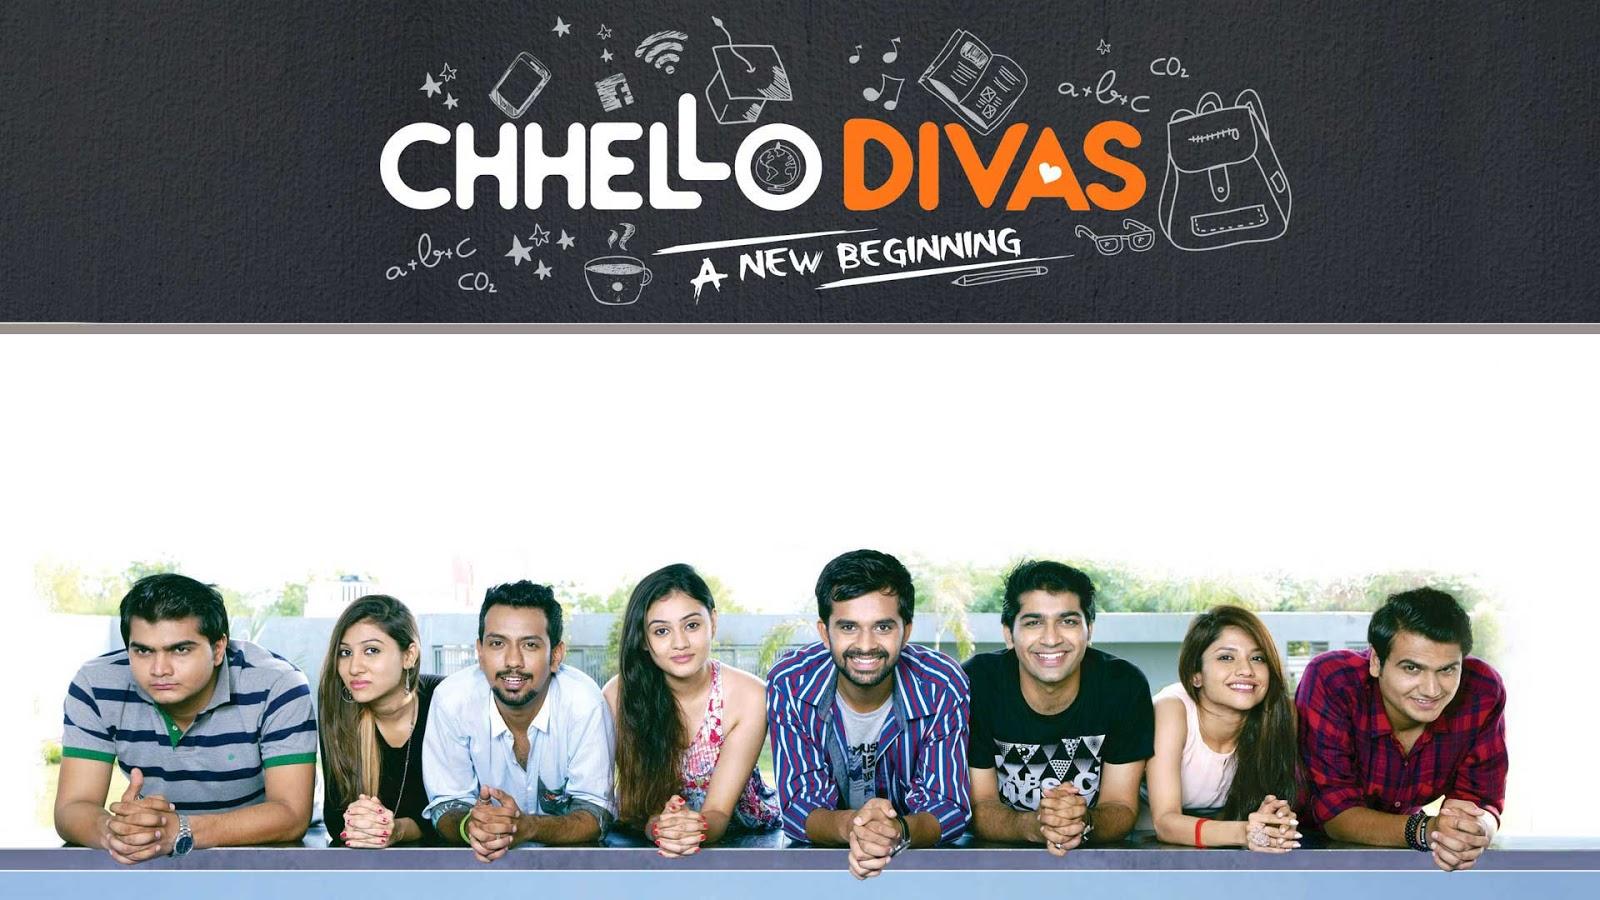 Chhello Divas Full Movie Download 9xmovies Org Pagalwarld